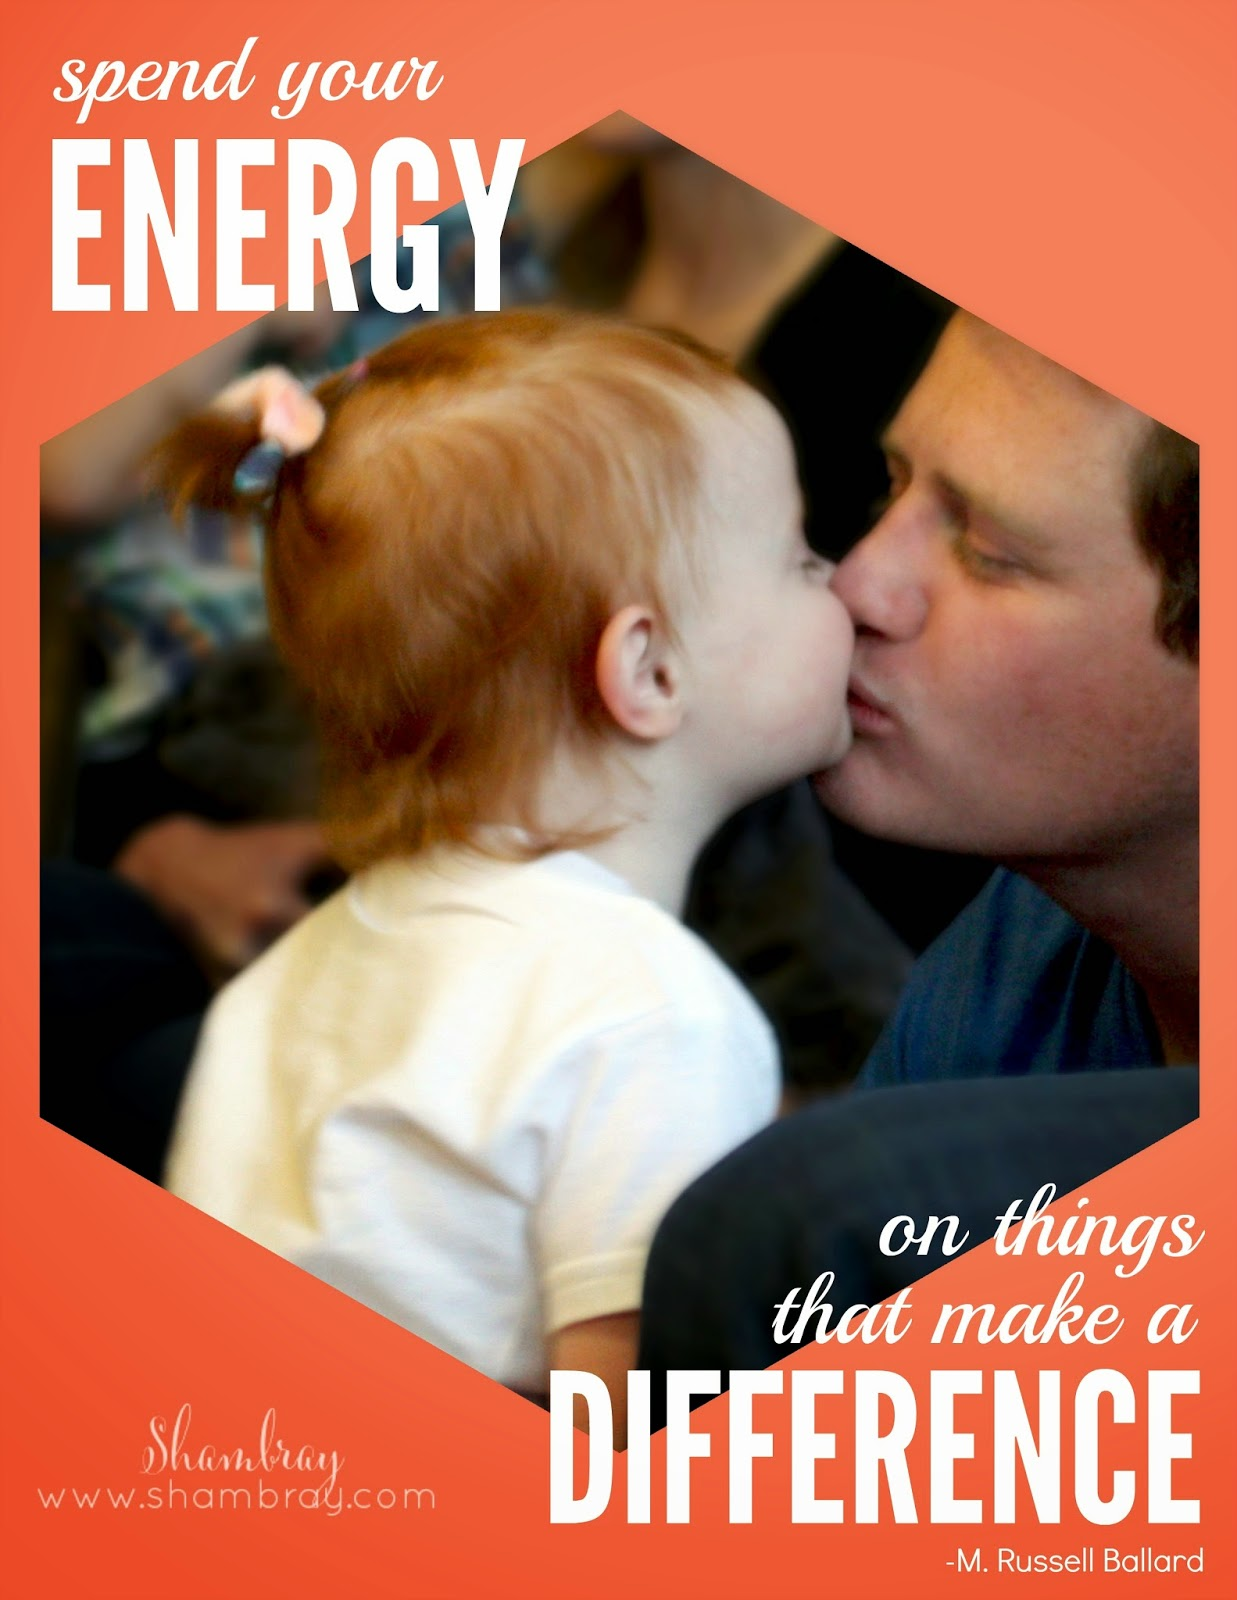 energy, kids, bond, relationship